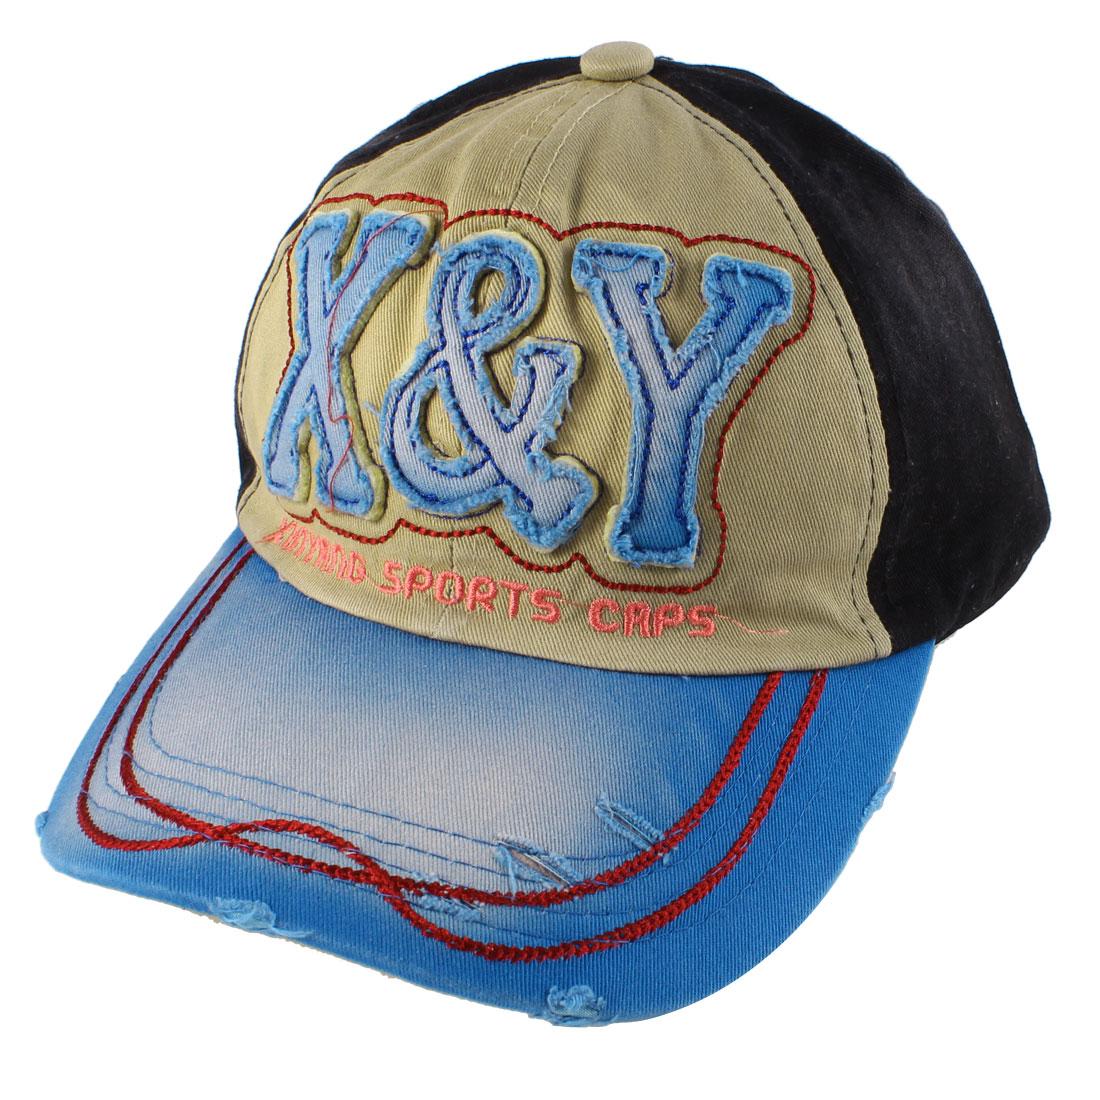 Unisex Embroidering Letter Side Decor Adjustable Baseball Hat Khaki Blue